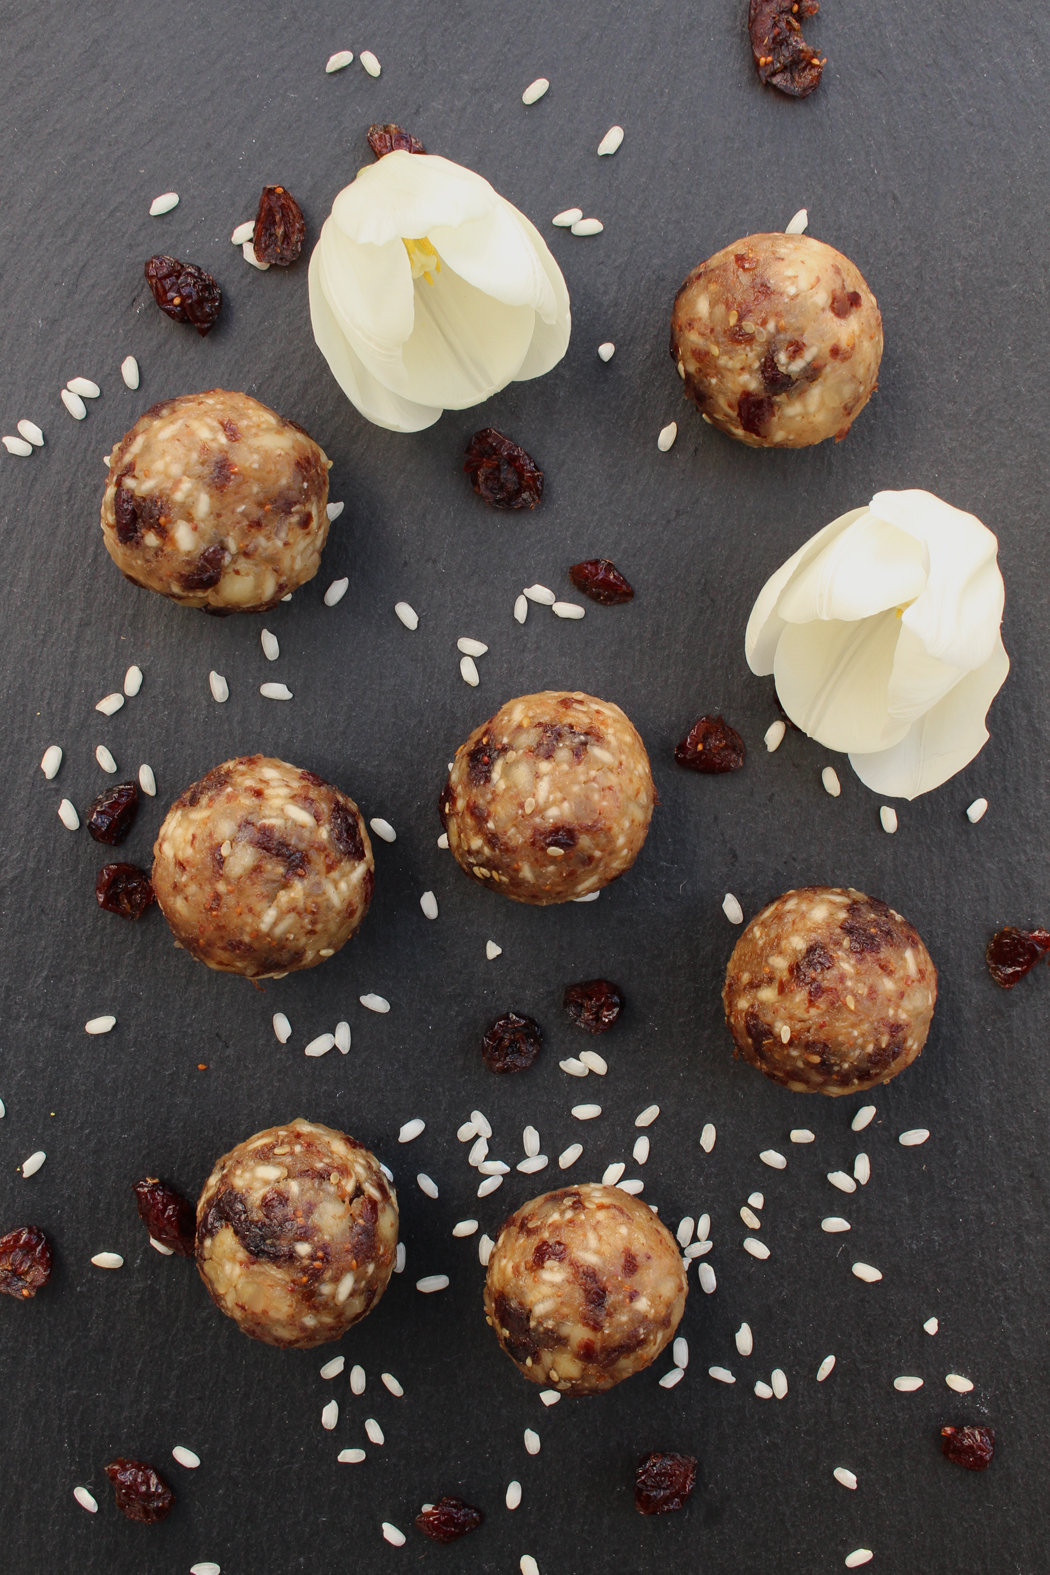 macadamia cranberry balls mit reis01 projekt gesund. Black Bedroom Furniture Sets. Home Design Ideas